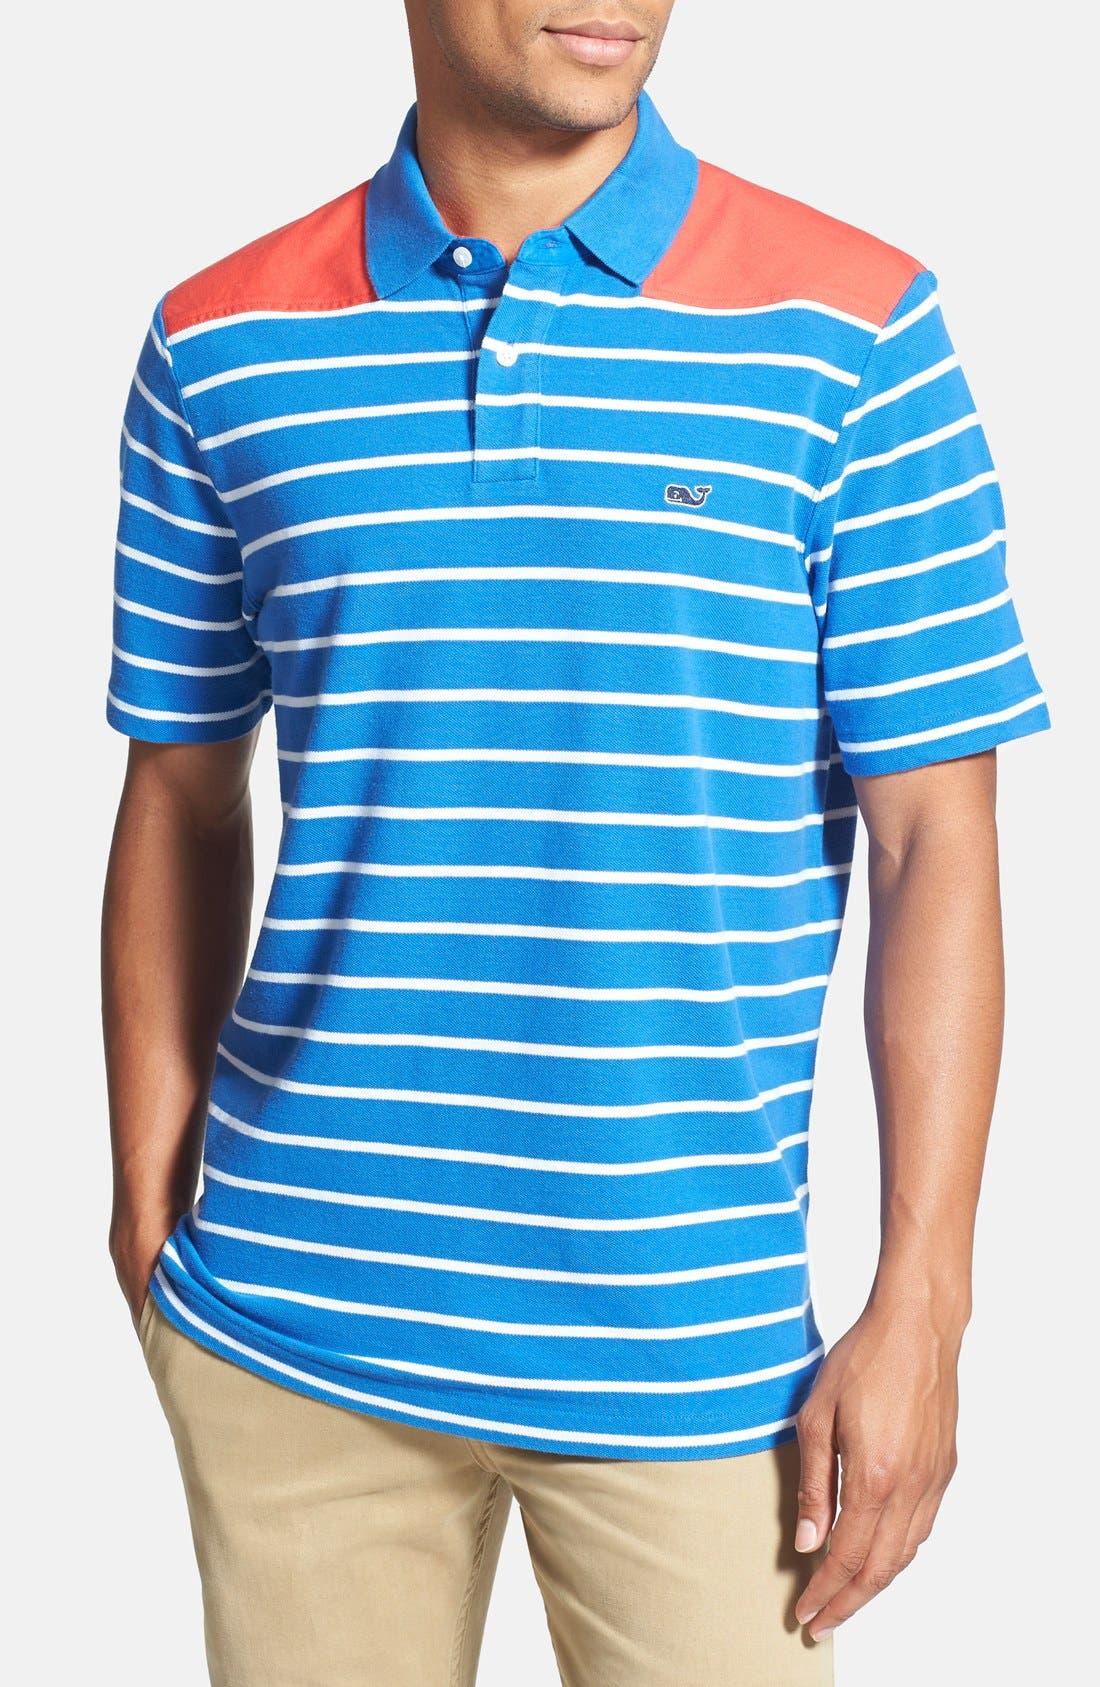 Main Image - Vineyard Vines 'Shep' Stripe Polo Shirt